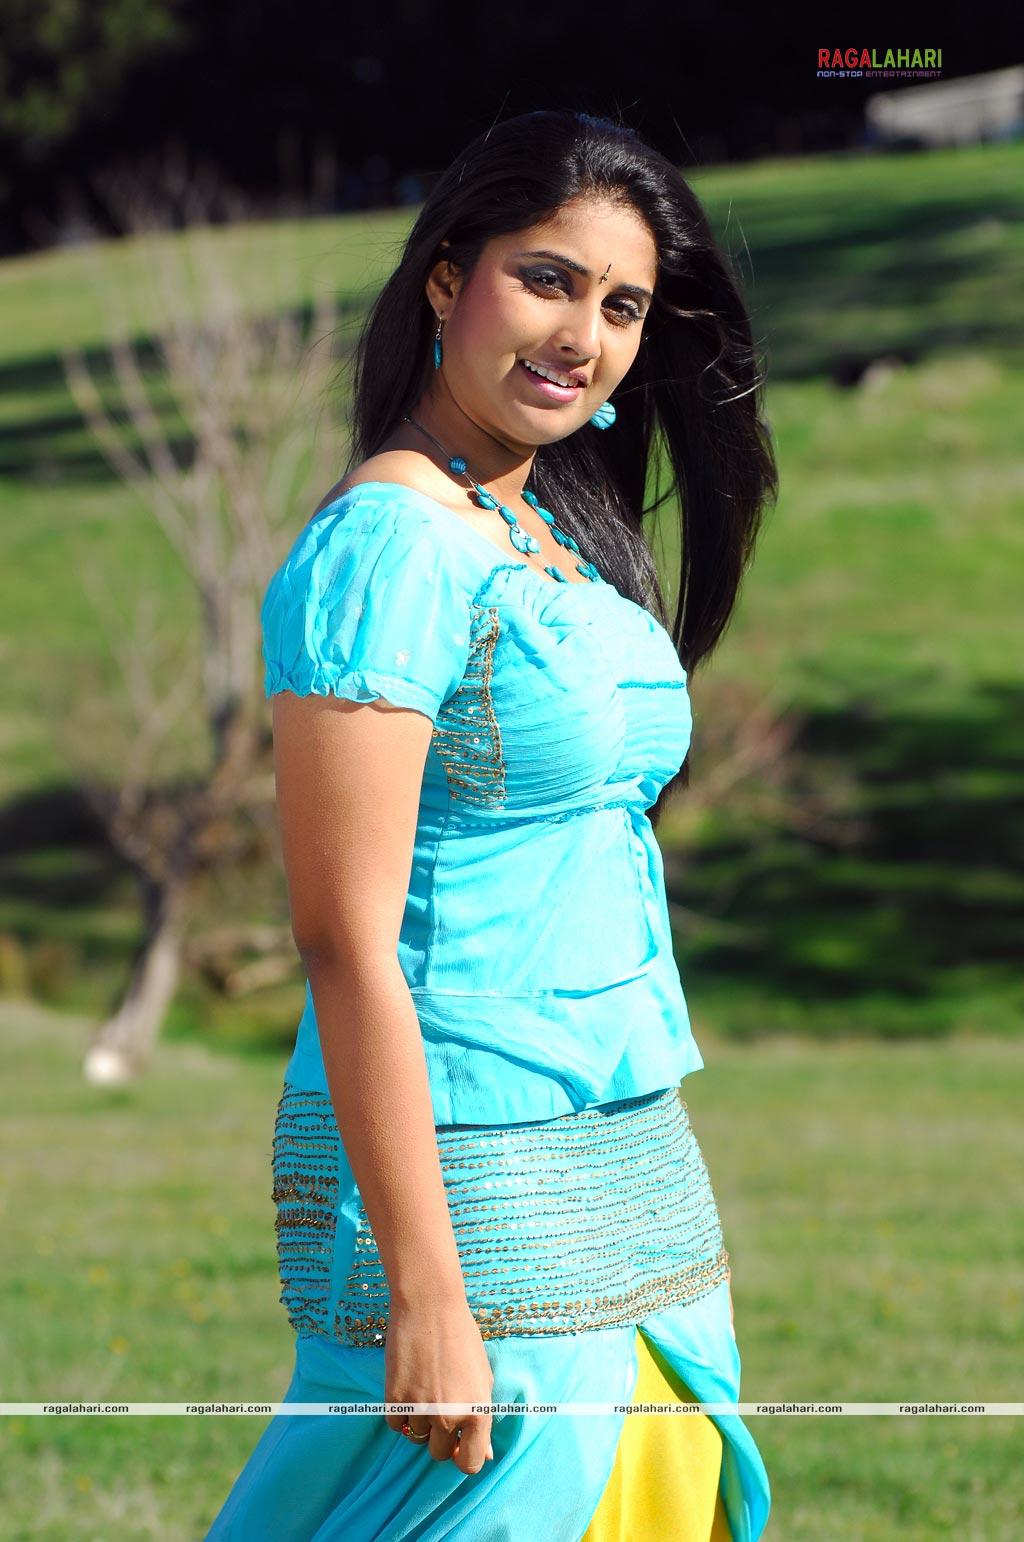 Baby Shamili cute hot photos | Creative News Information ...